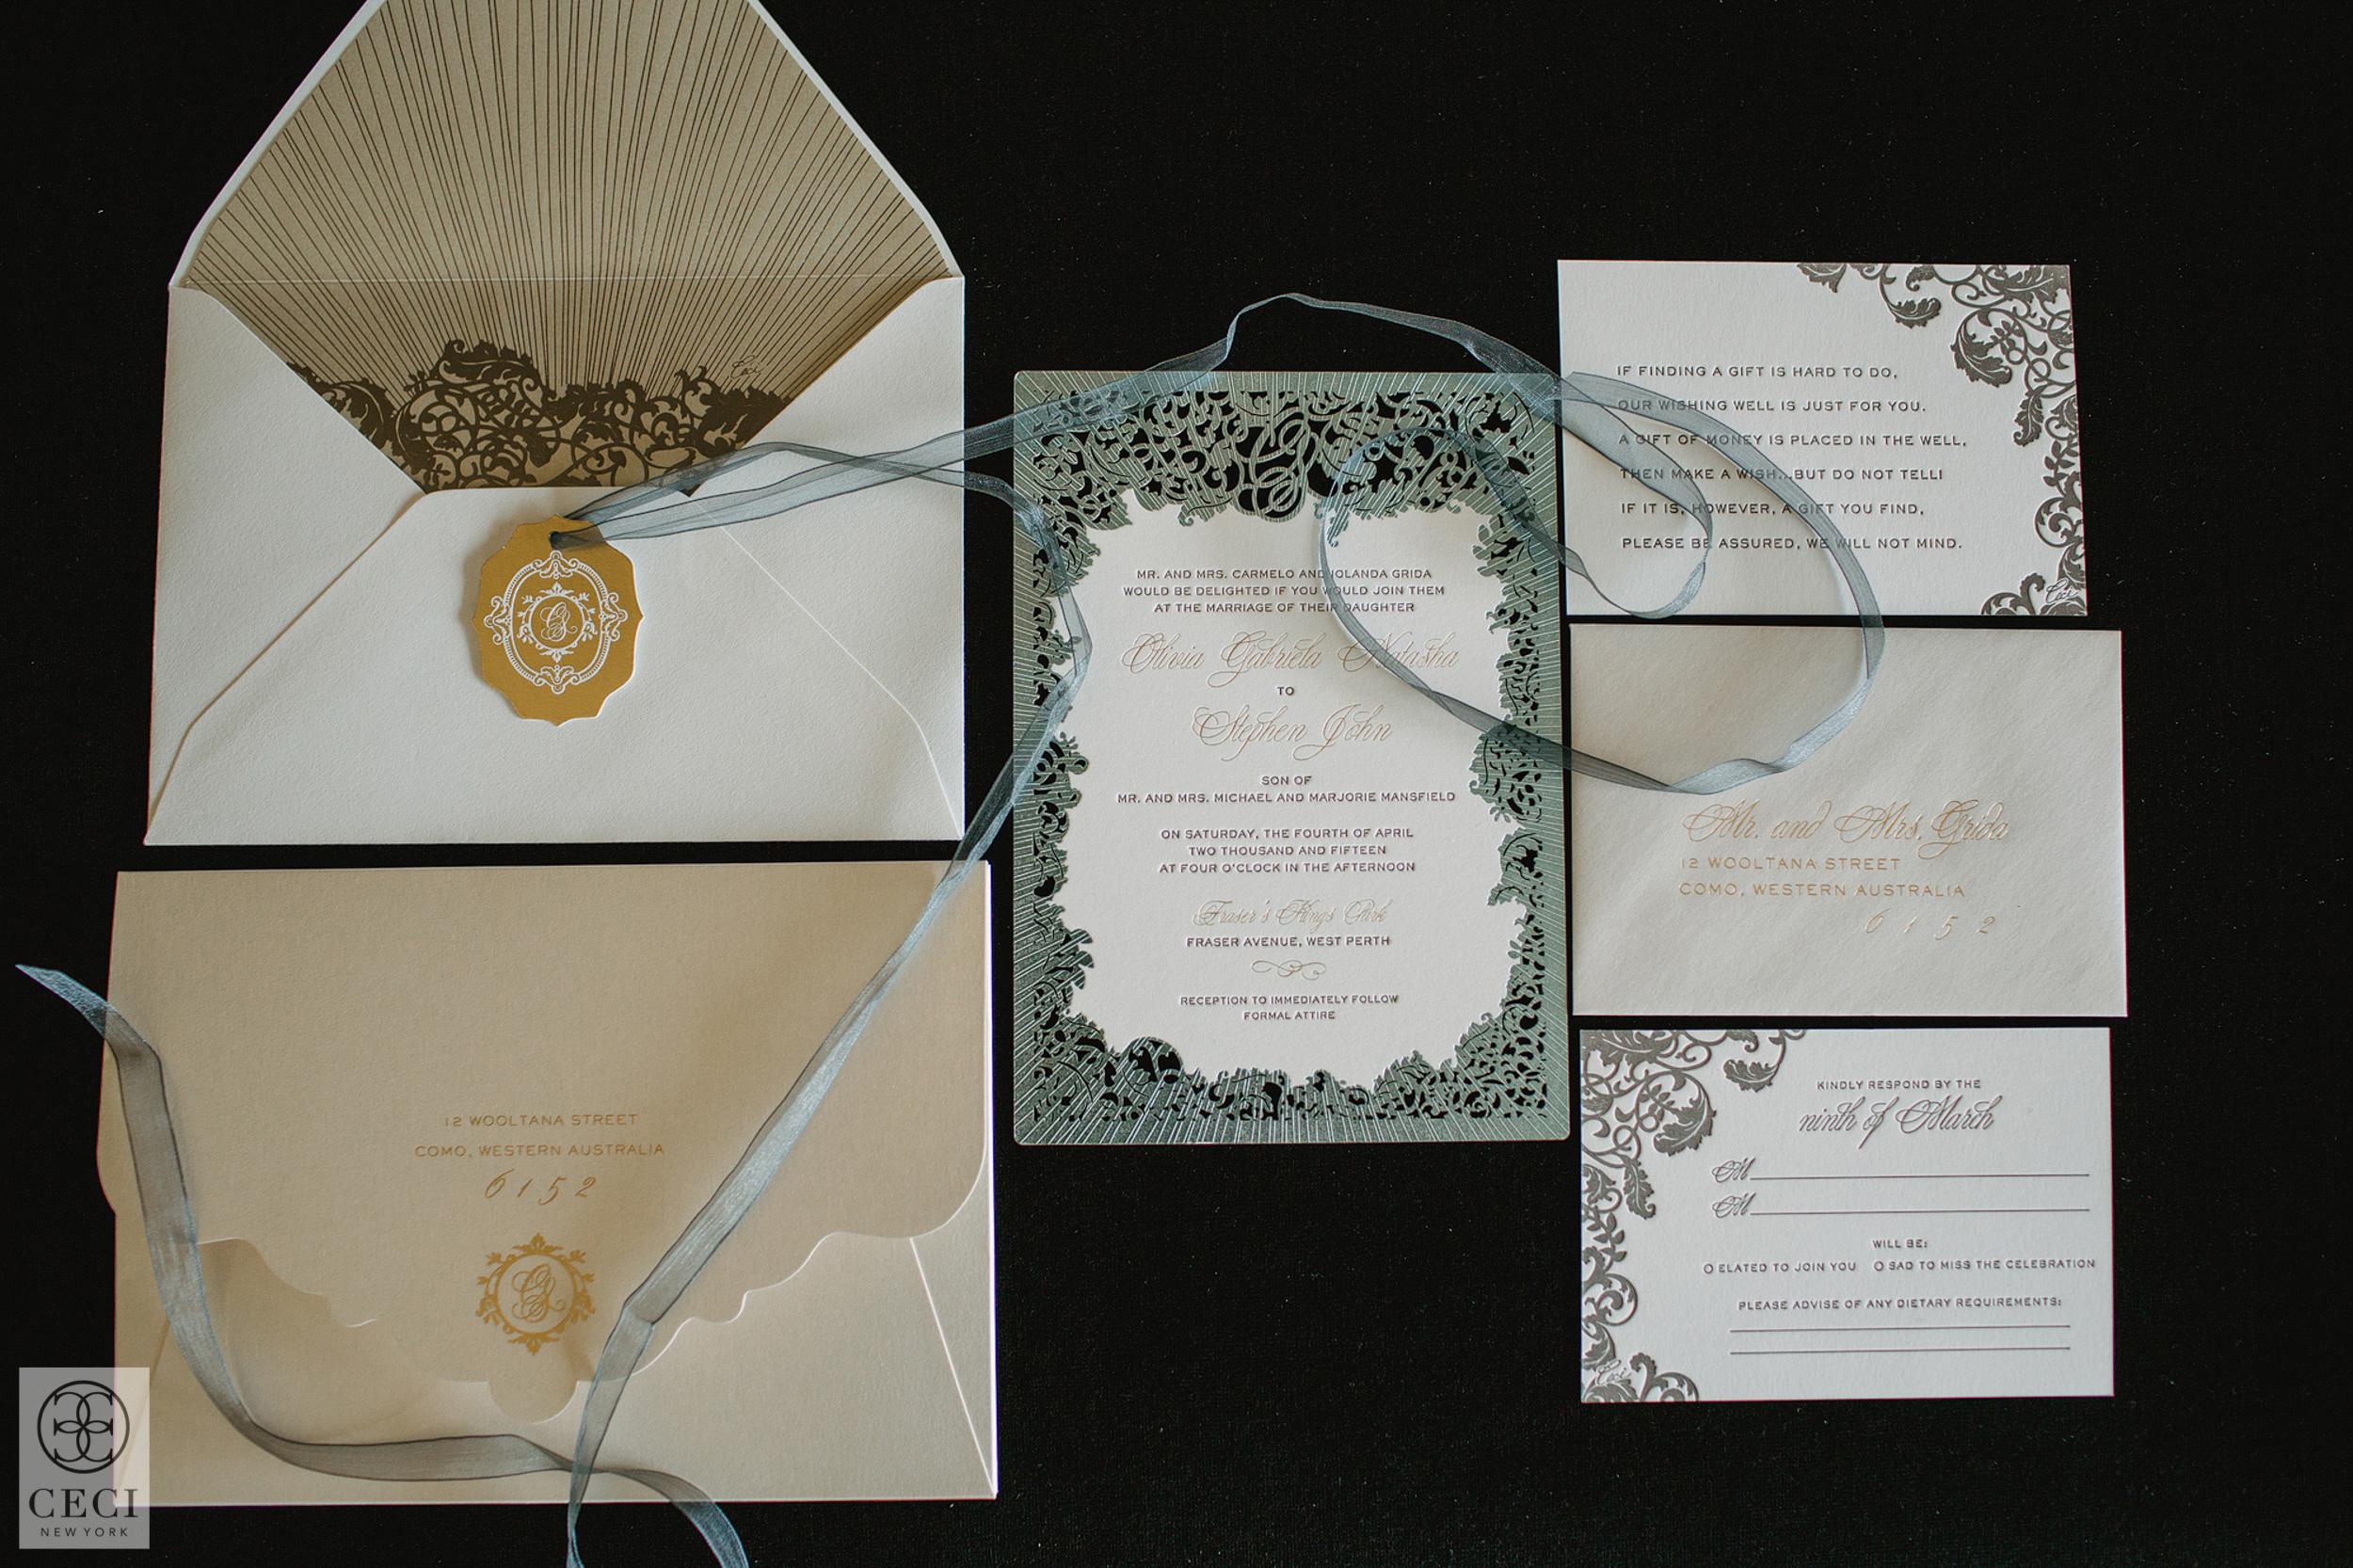 Ceci_New_York_Custom_Luxury_Wedding_BeautyShot_LaserCut_Stationery_Personalized_Couture_Foil_Stamping_Perth_Destination_Australia_Chic_.jpg